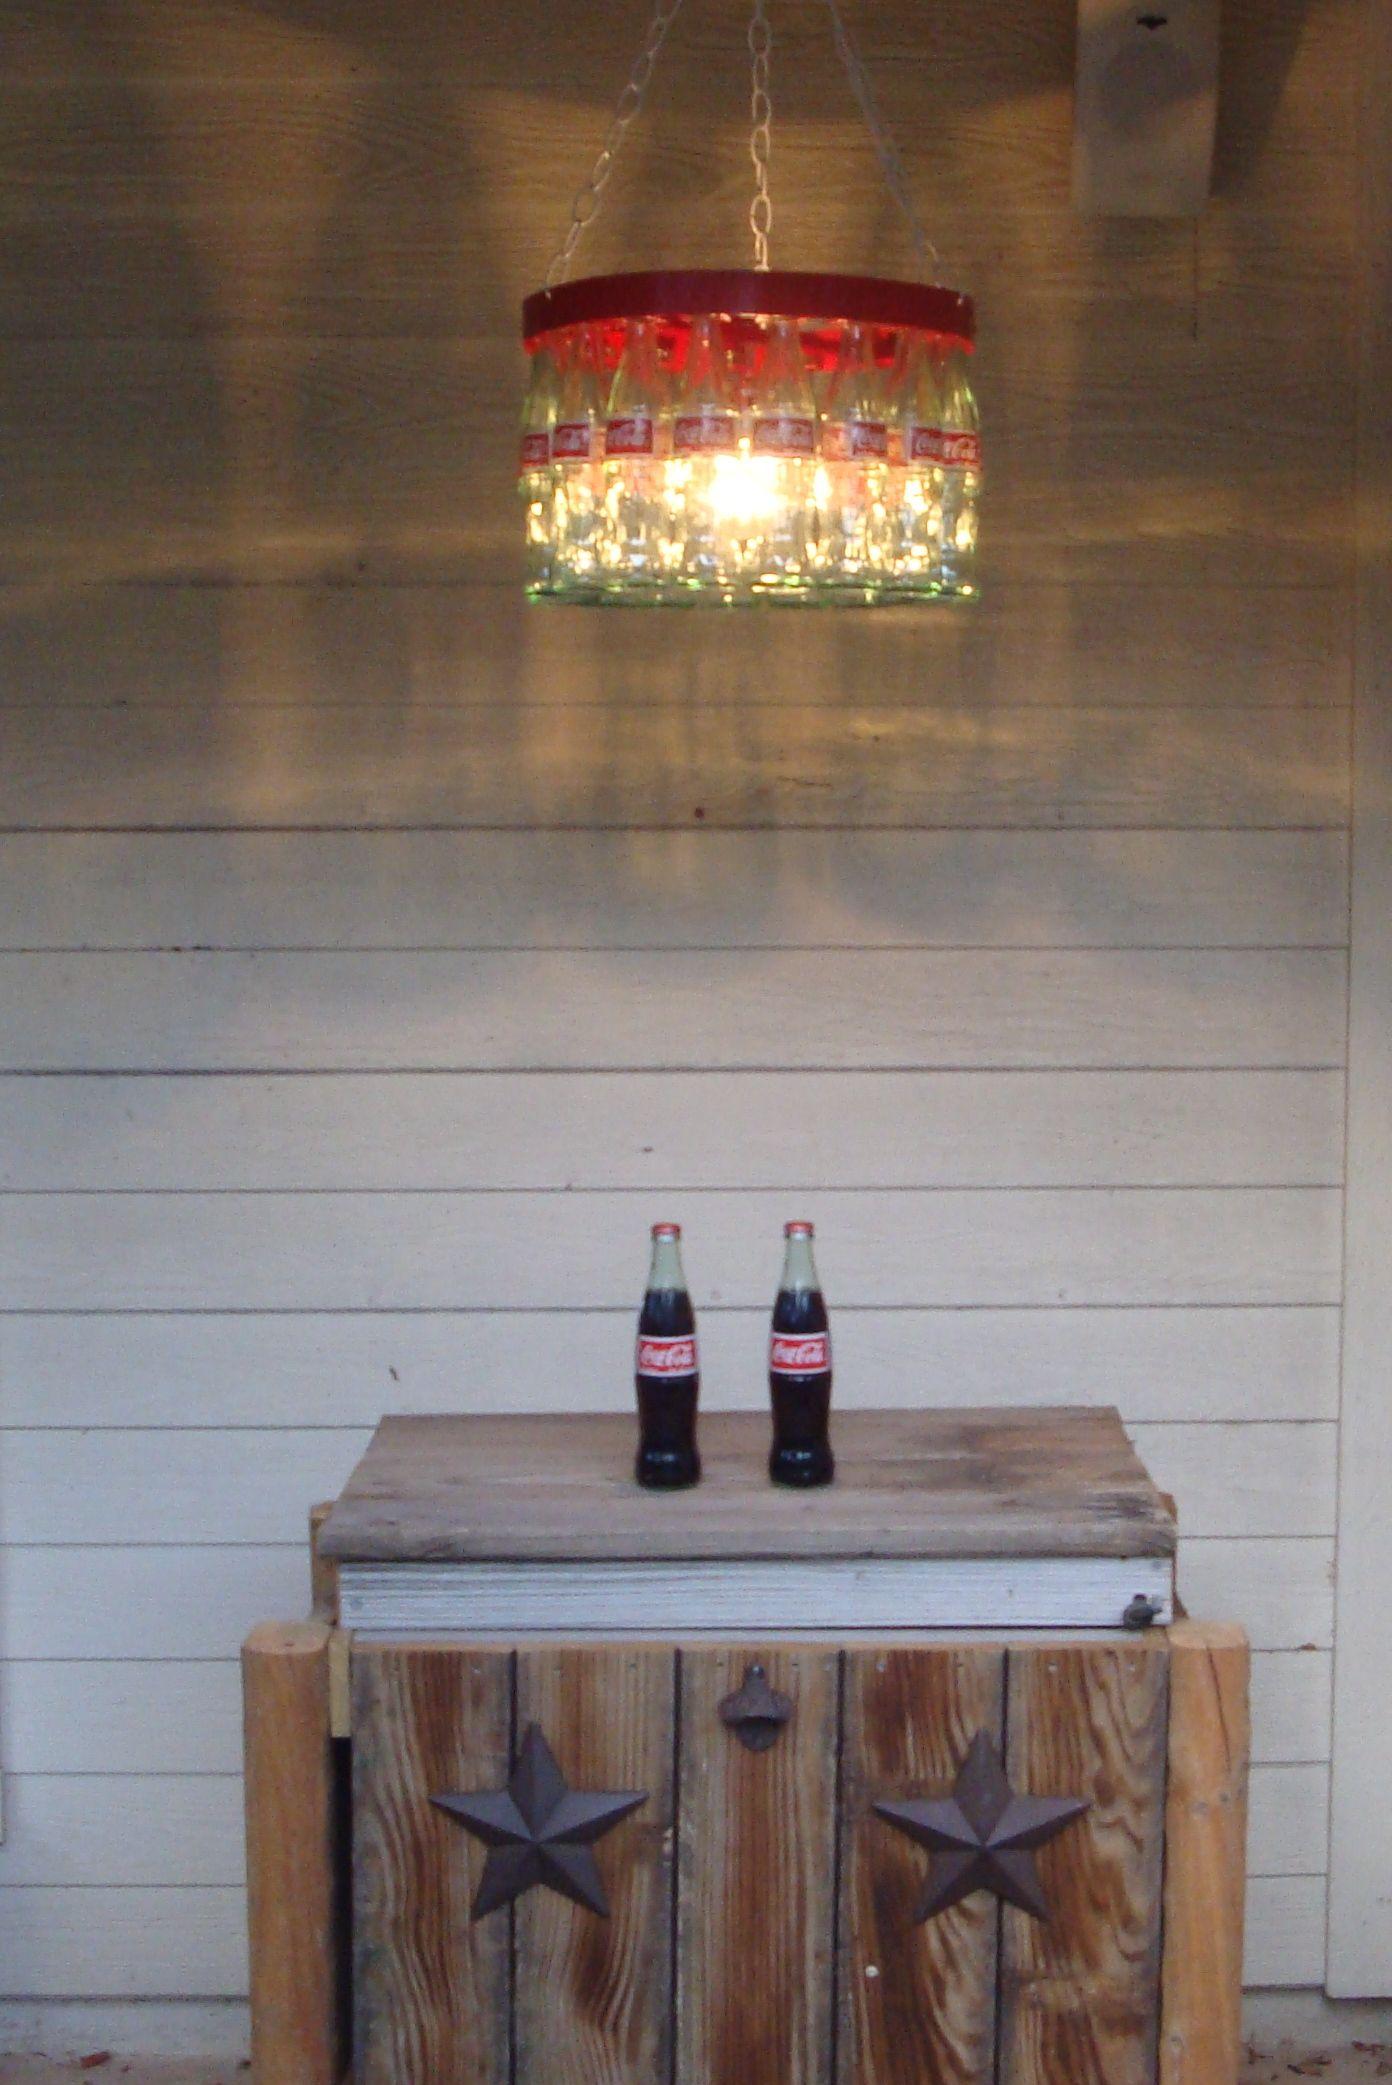 Coke bottle chandelier coke photo tomb sweet tomb pinterest coke bottle chandelier coke photo arubaitofo Images